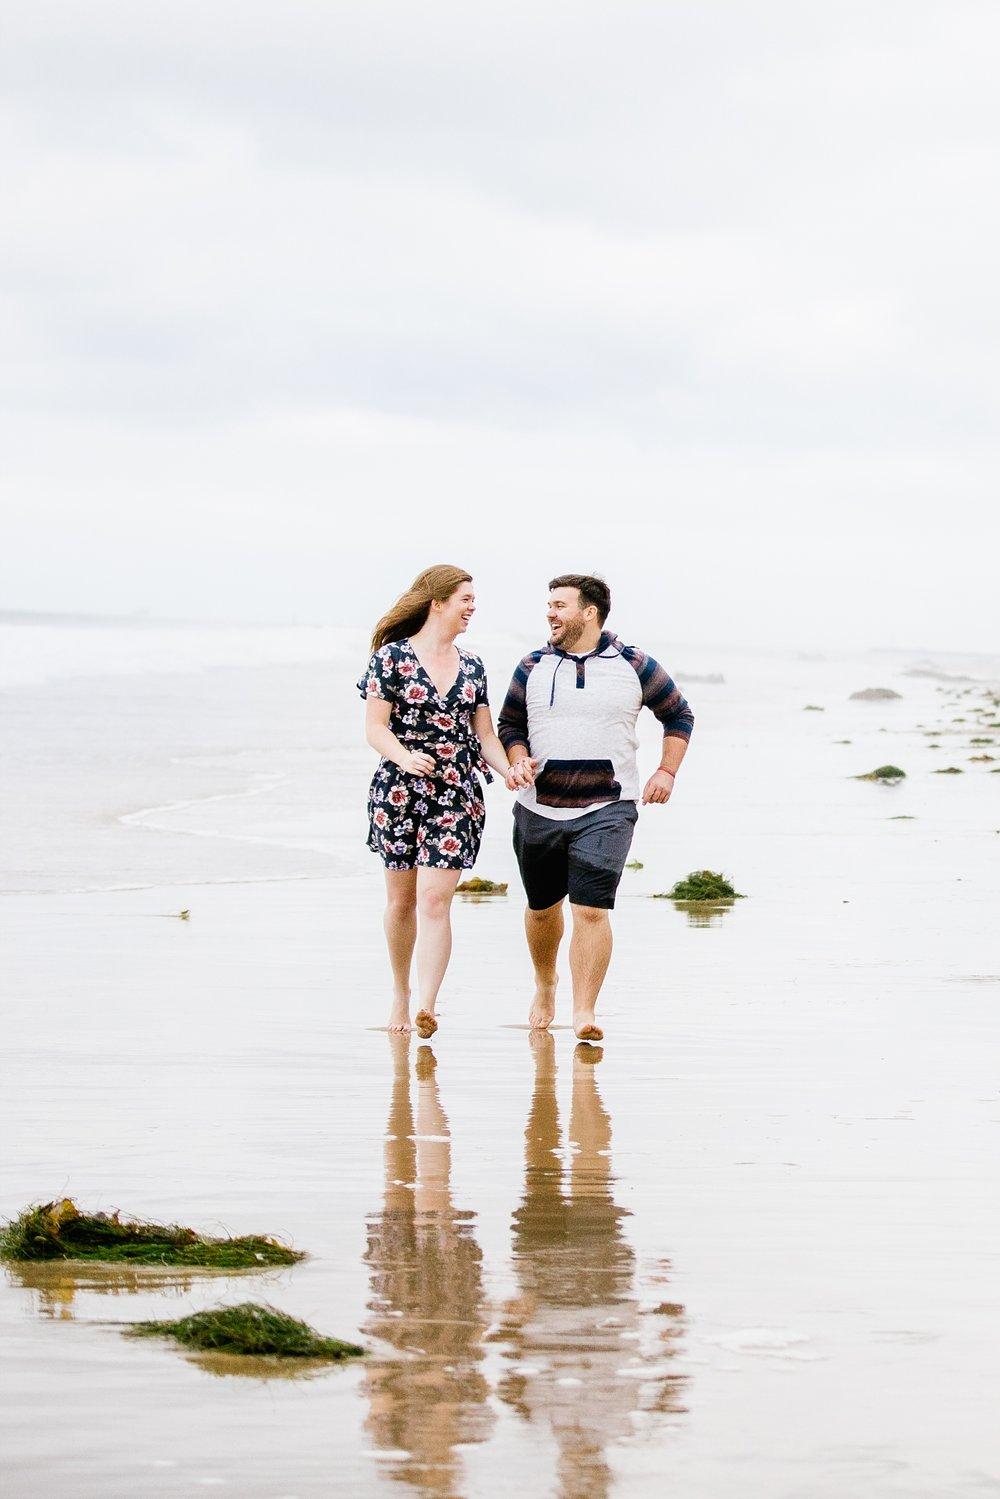 CassandraNathan-45E_Lizzie-B-Imagery-California-Wedding-Photographer-Crystal-Cove-Photography-Engagement-Session-Orange-County-Wedding-Photographer.jpg